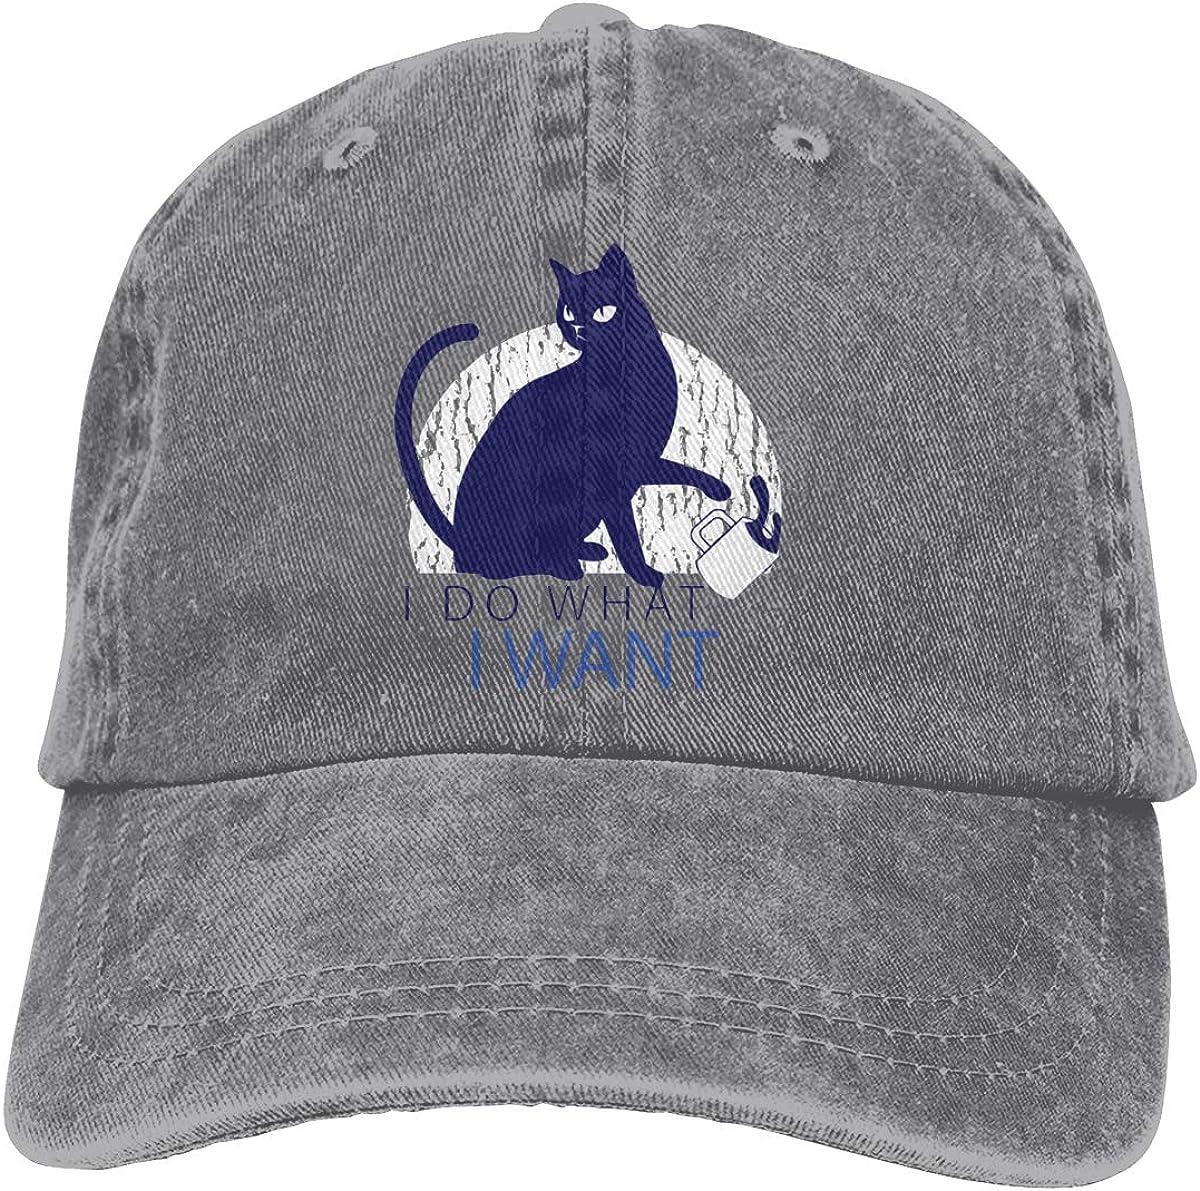 I Do What I Want Vintage Unisex Adjustable Baseball Cap Denim Dad Hat